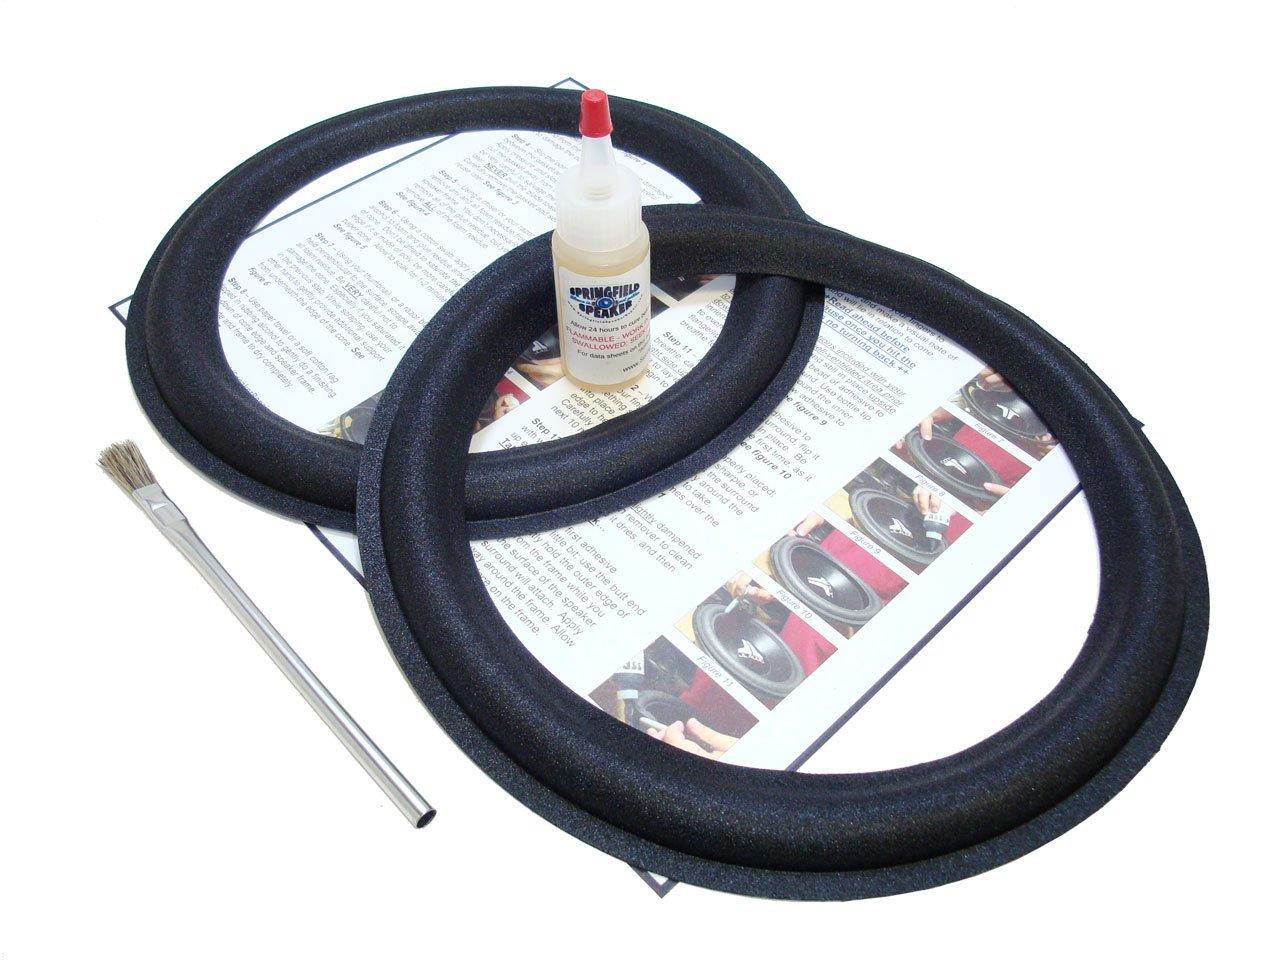 Boston Acoustics 10'' Speaker Foam Surround Repair Kit - 10 Inch